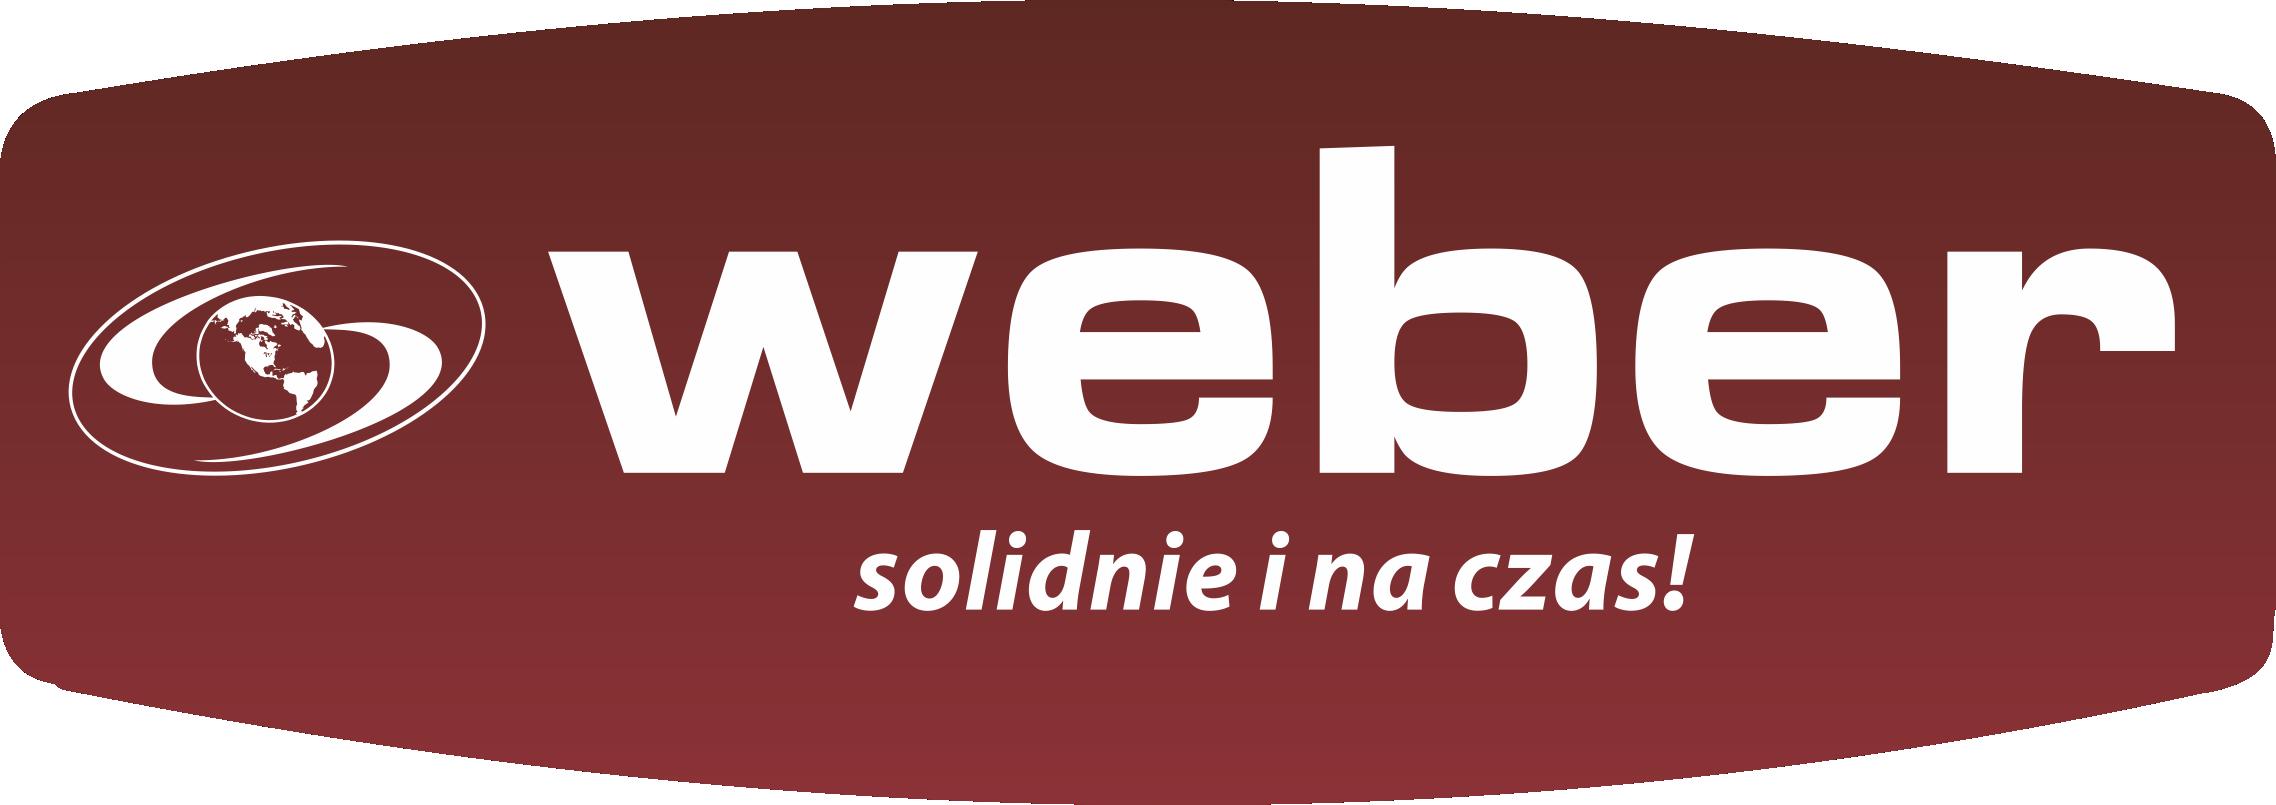 Weber - Biuro Tłumaczeń i Usług DE